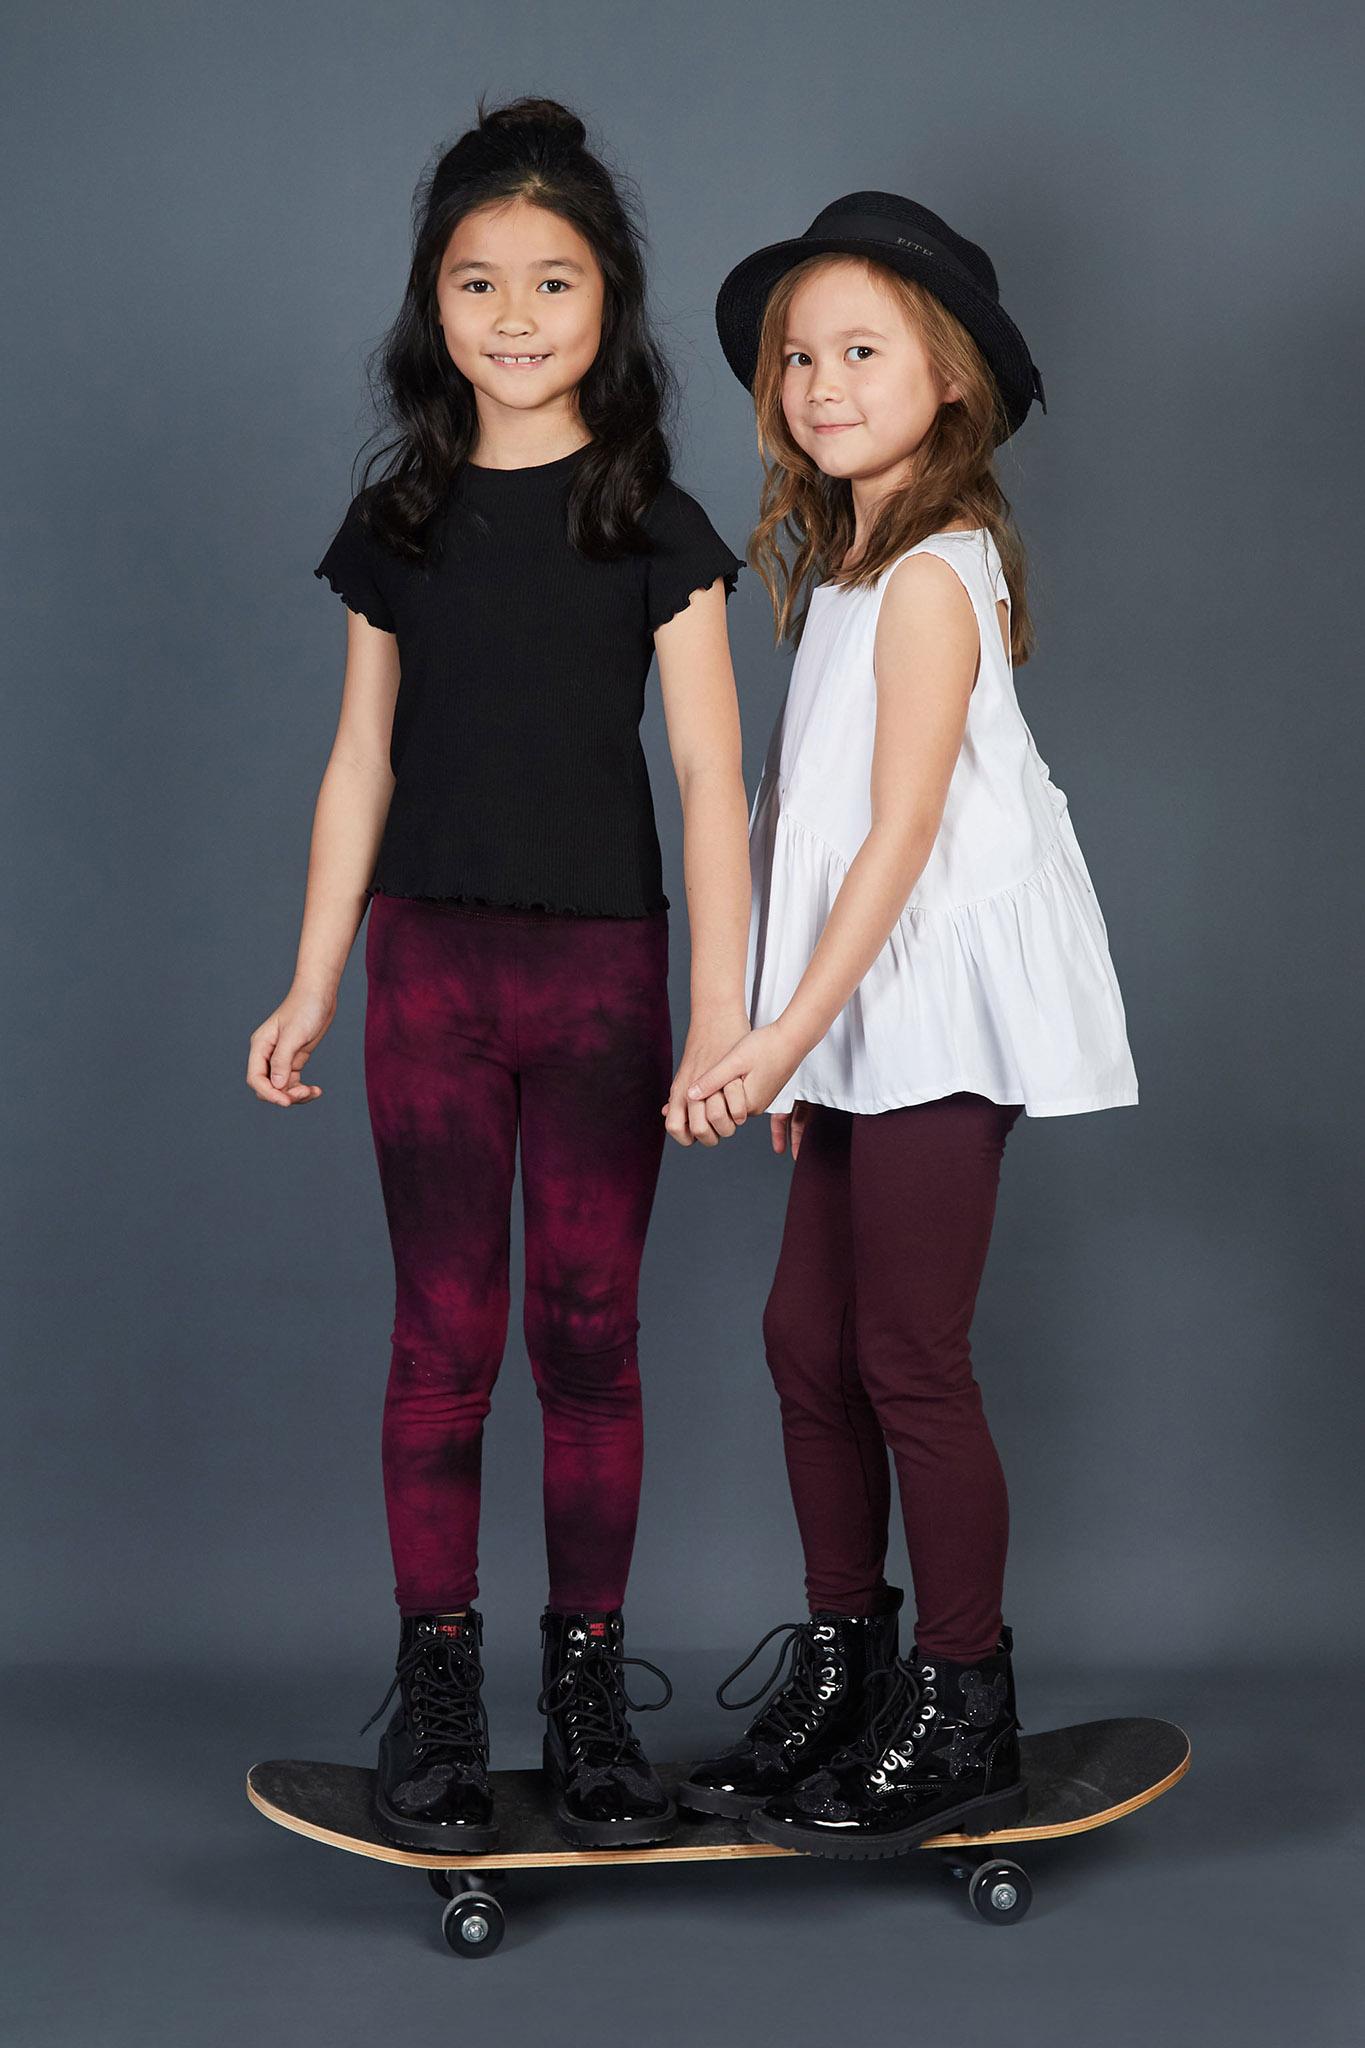 kids-catalog-photography-the-jersey-shop-2